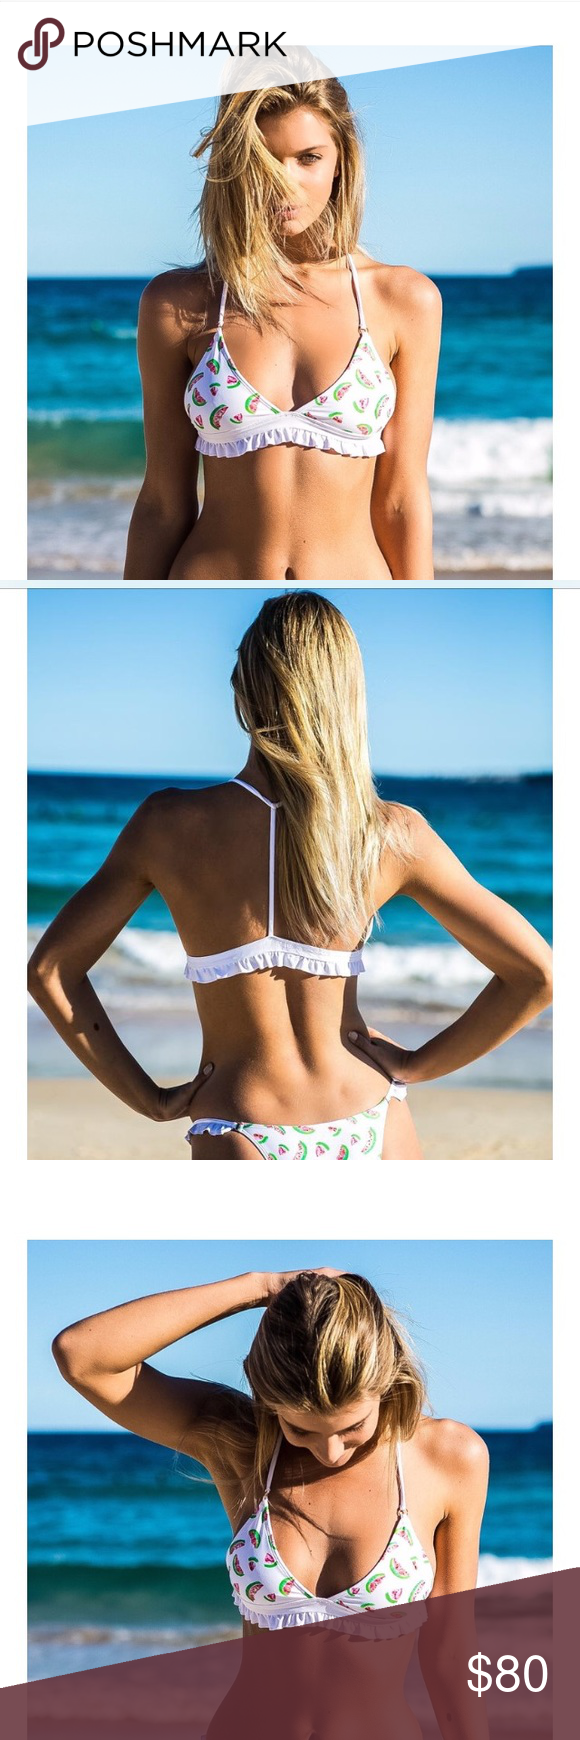 Watermelon print bikini top Amore and Sorvete Super cute ...